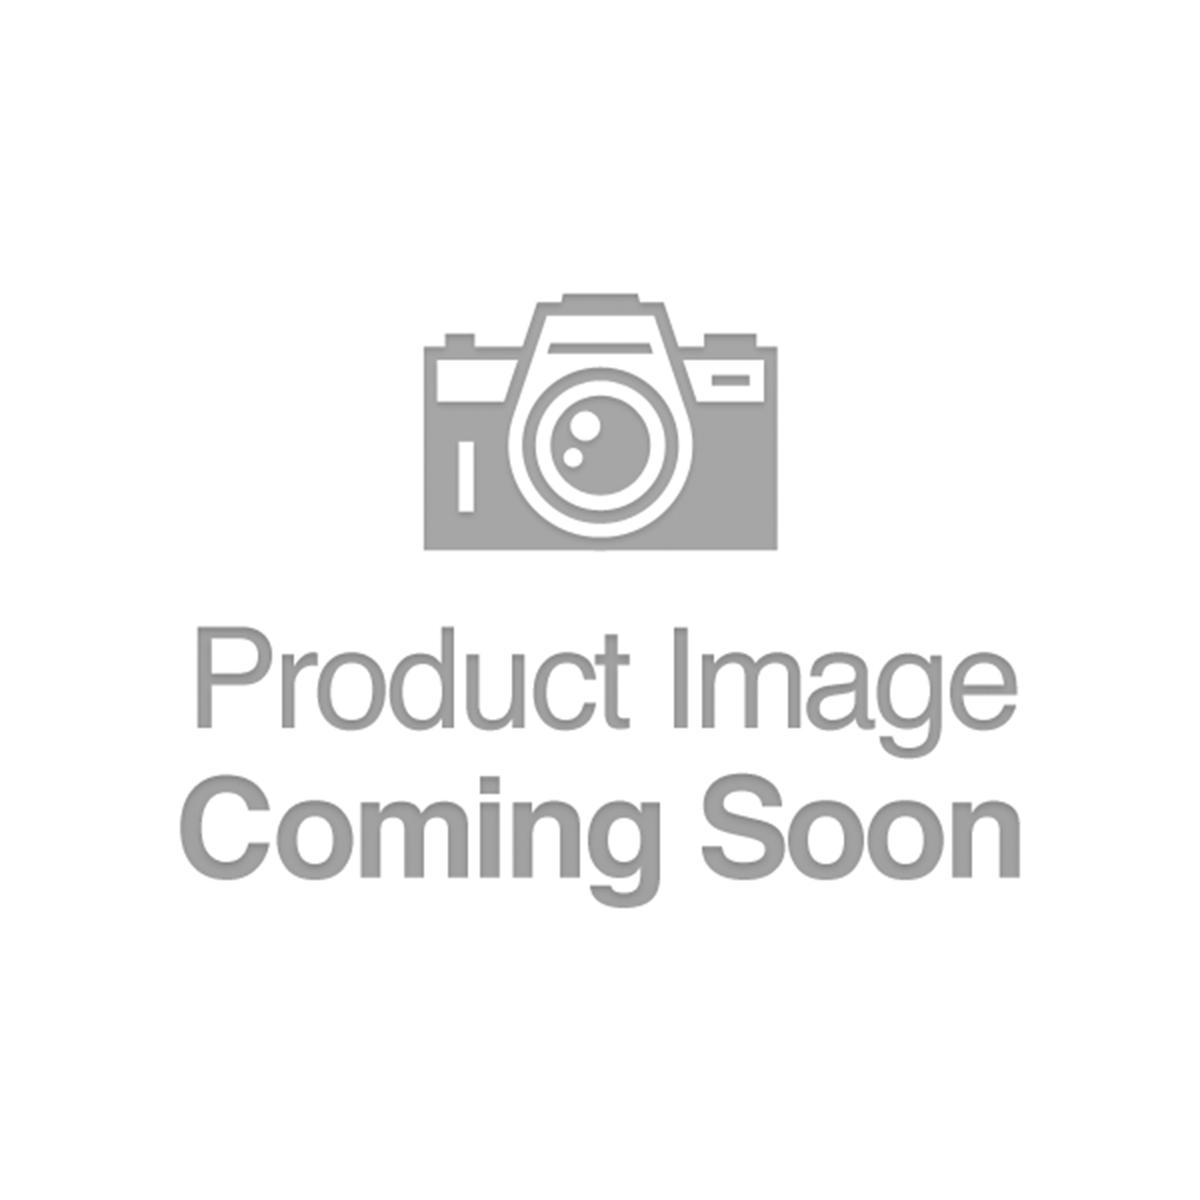 Sisterville - West Virginia - CH 5028 - FR 632 - Fine